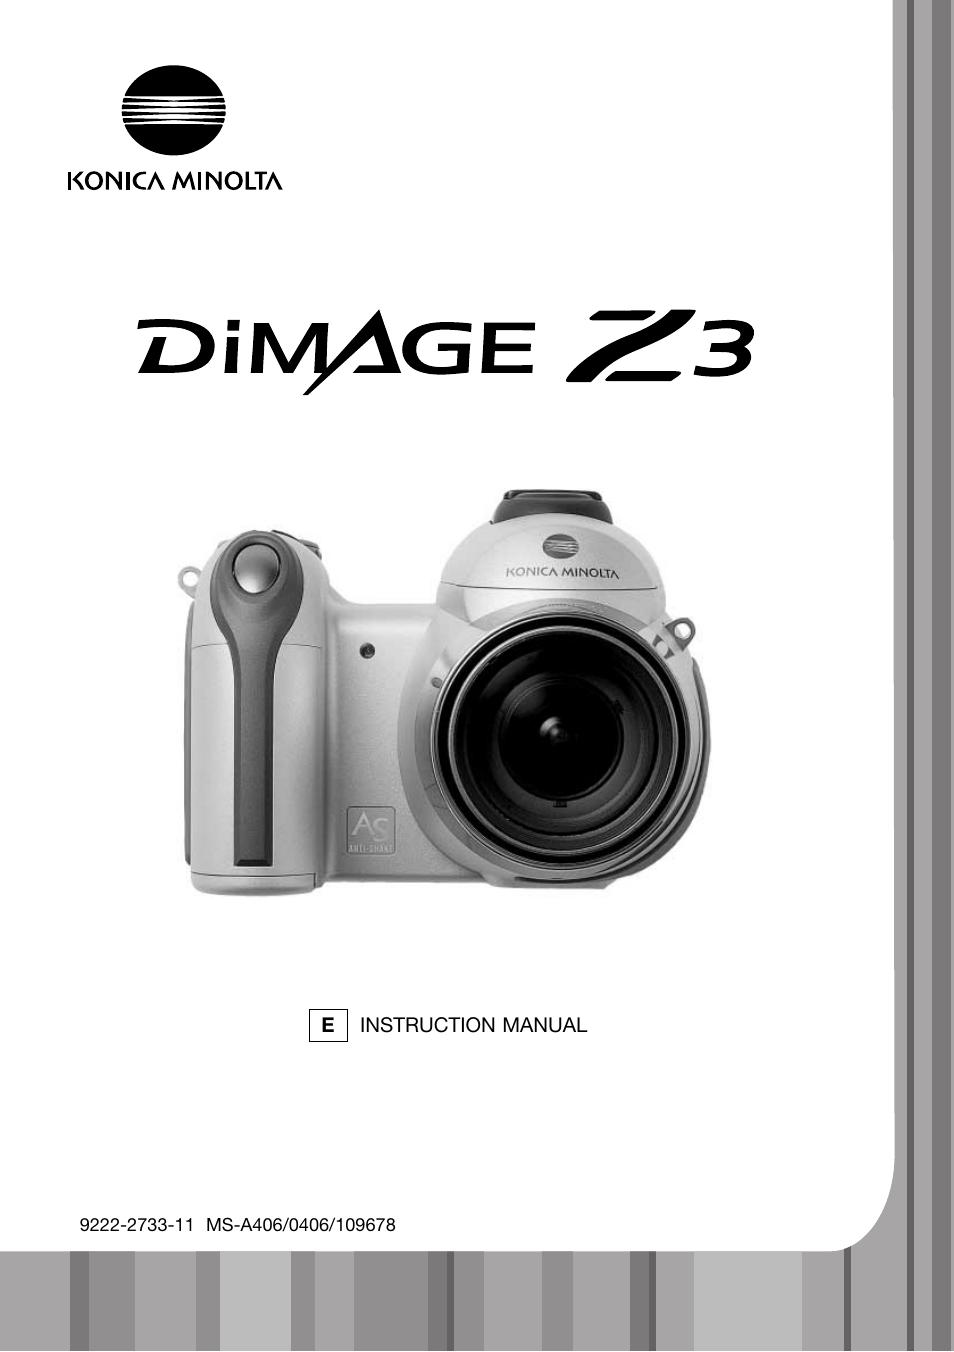 konica minolta dimage z3 user manual 124 pages rh manualsdir com Minolta DiMAGE XT Digital Camera Minolta DiMAGE XT Digital Camera